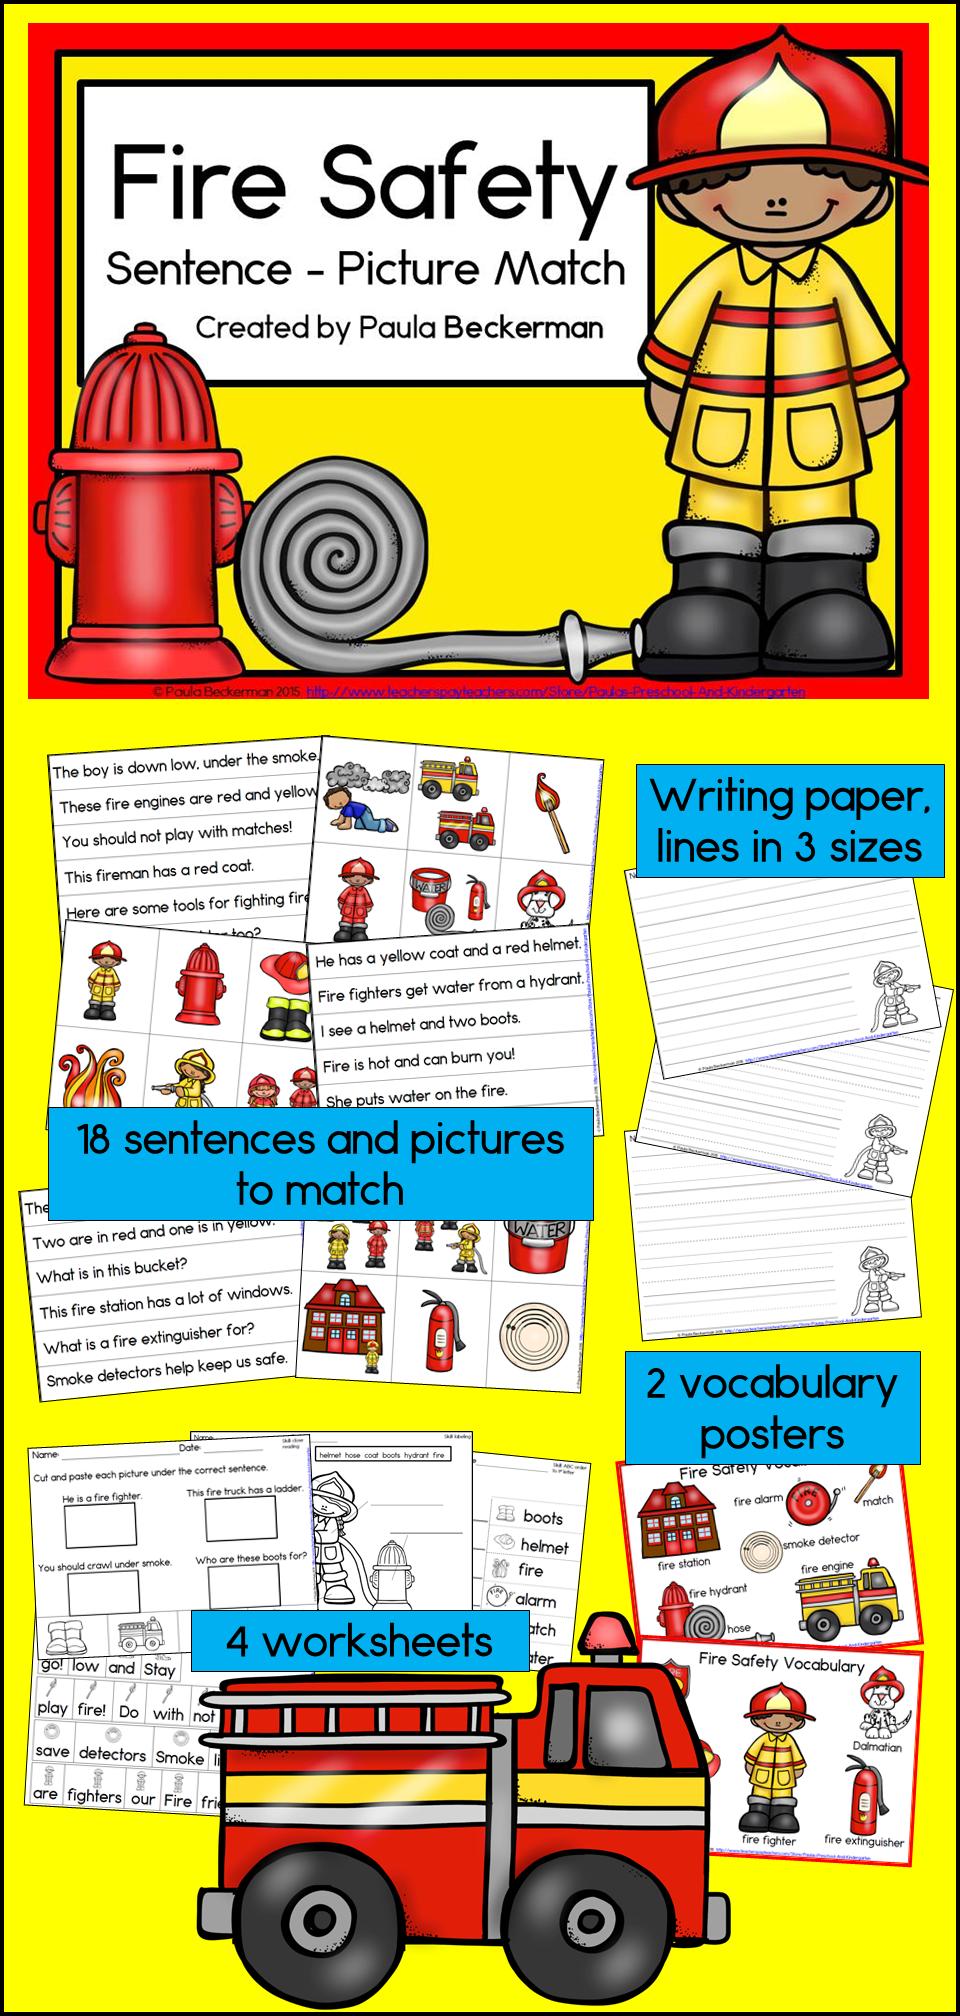 Fire Safety Sentence Picture Match Reading Center Kindergarten First And Second Kindergarten Reading Centers Fire Safety Kindergarten Reading Activities [ 2016 x 960 Pixel ]